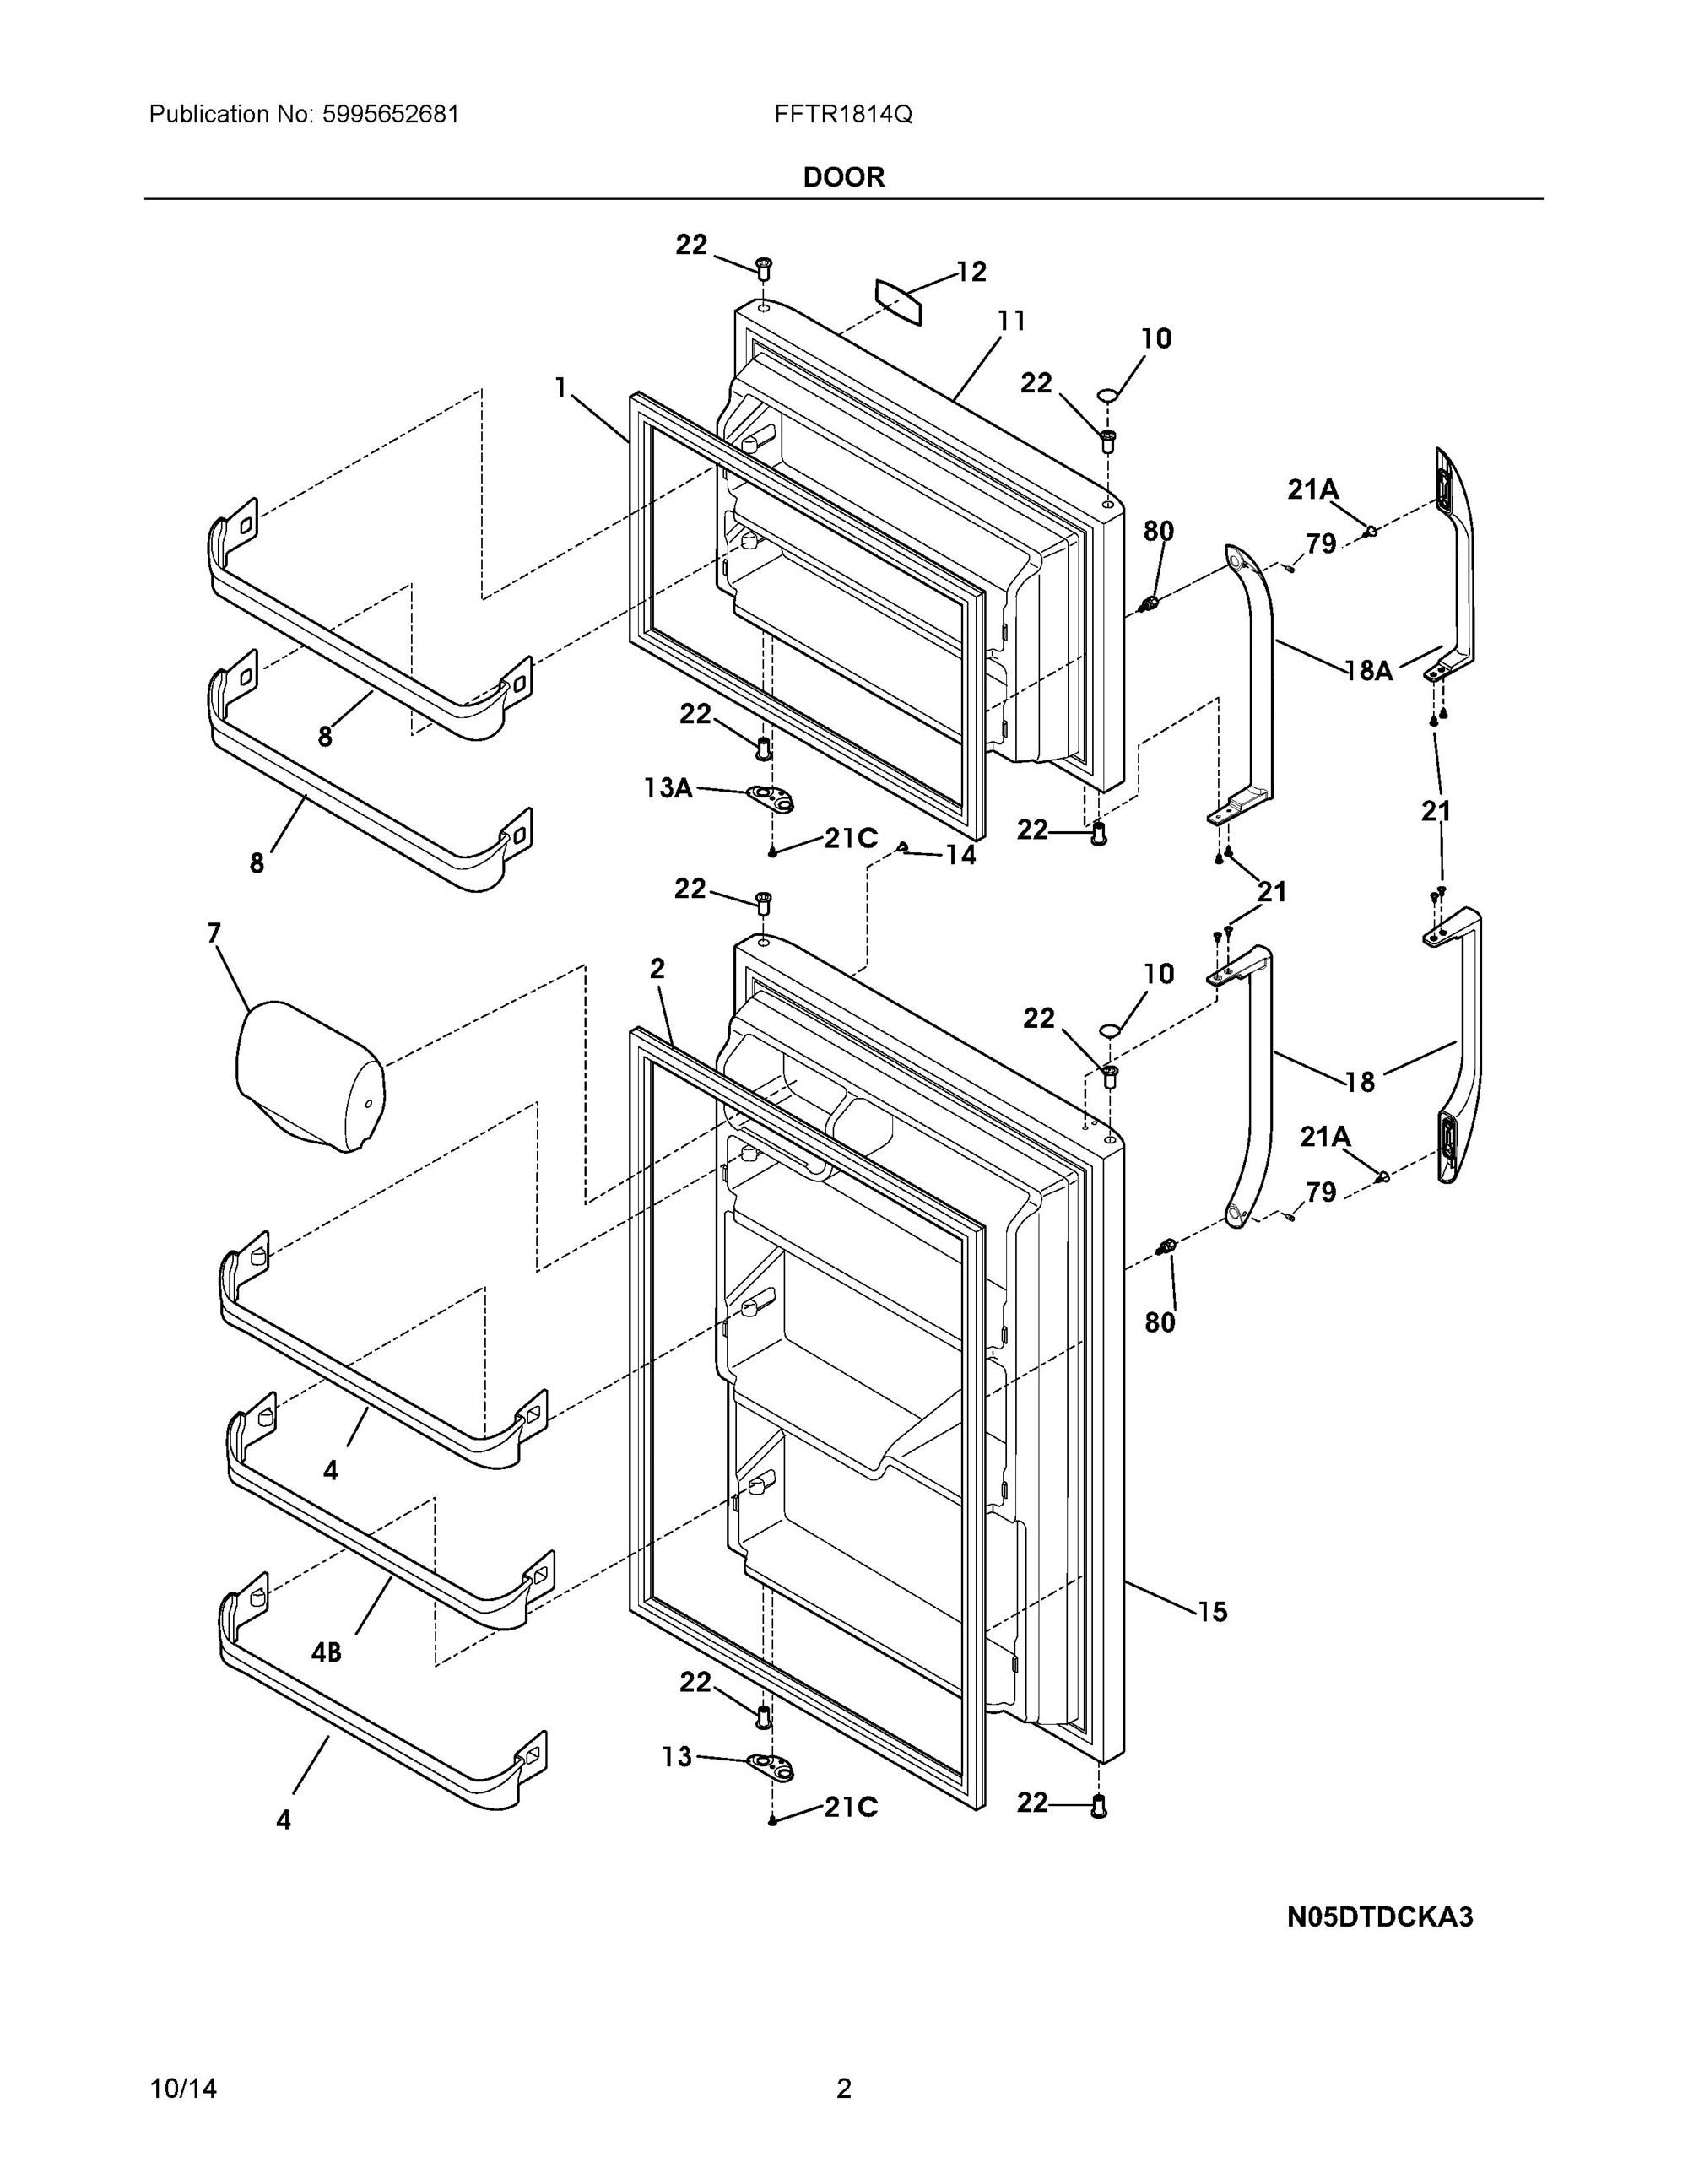 Fftr1814qw0 Door Frigidaire Company Appliance Parts